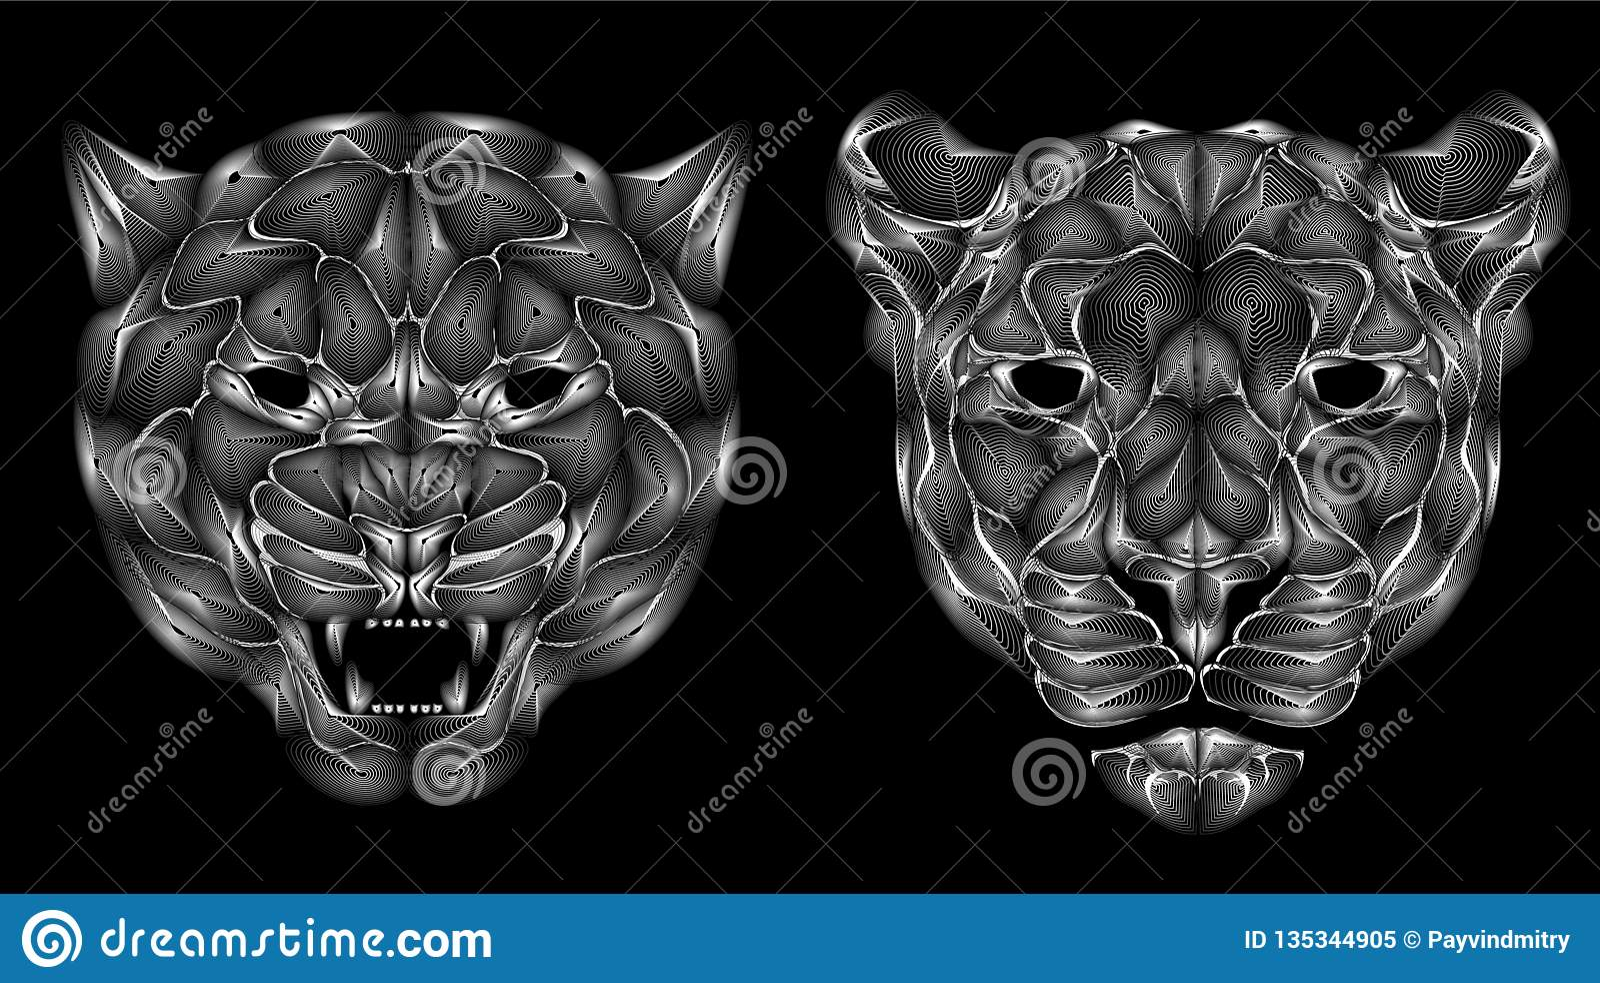 Lineart Illustration Jaguar Head Black And White Color Stock